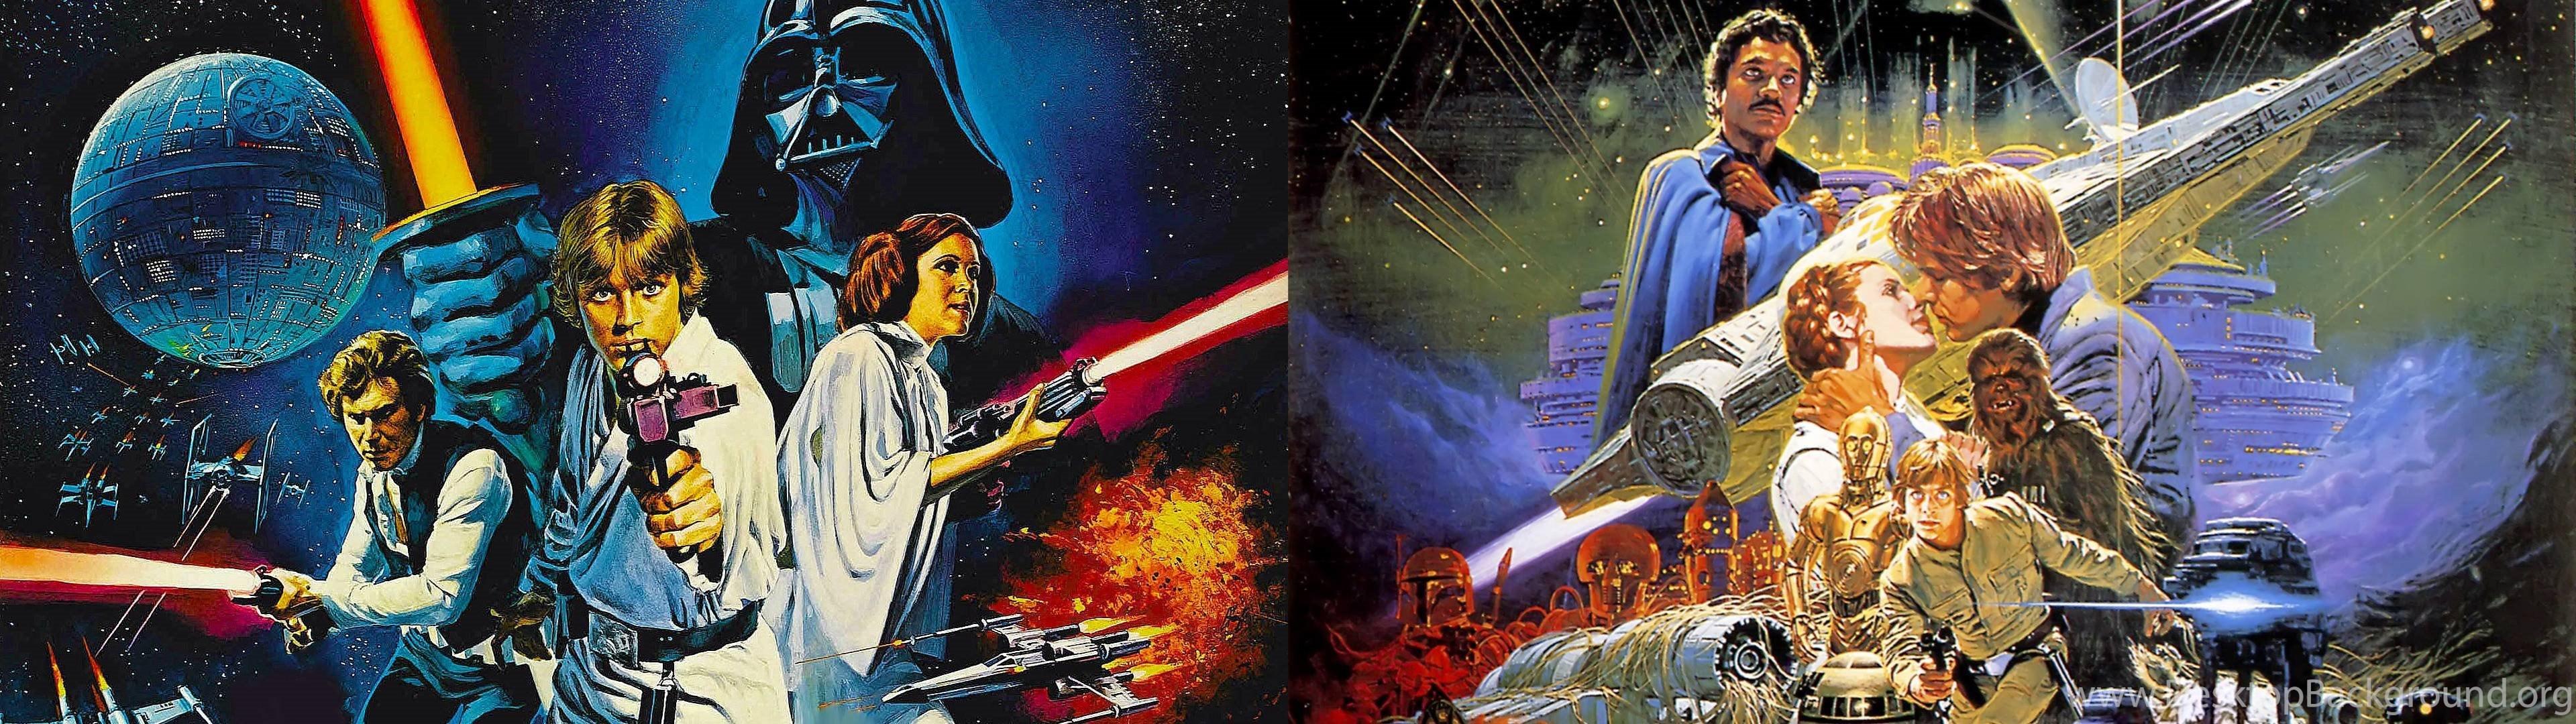 Star Wars Posters Dual Monitor Wallpapers Album On Imgur Desktop Background